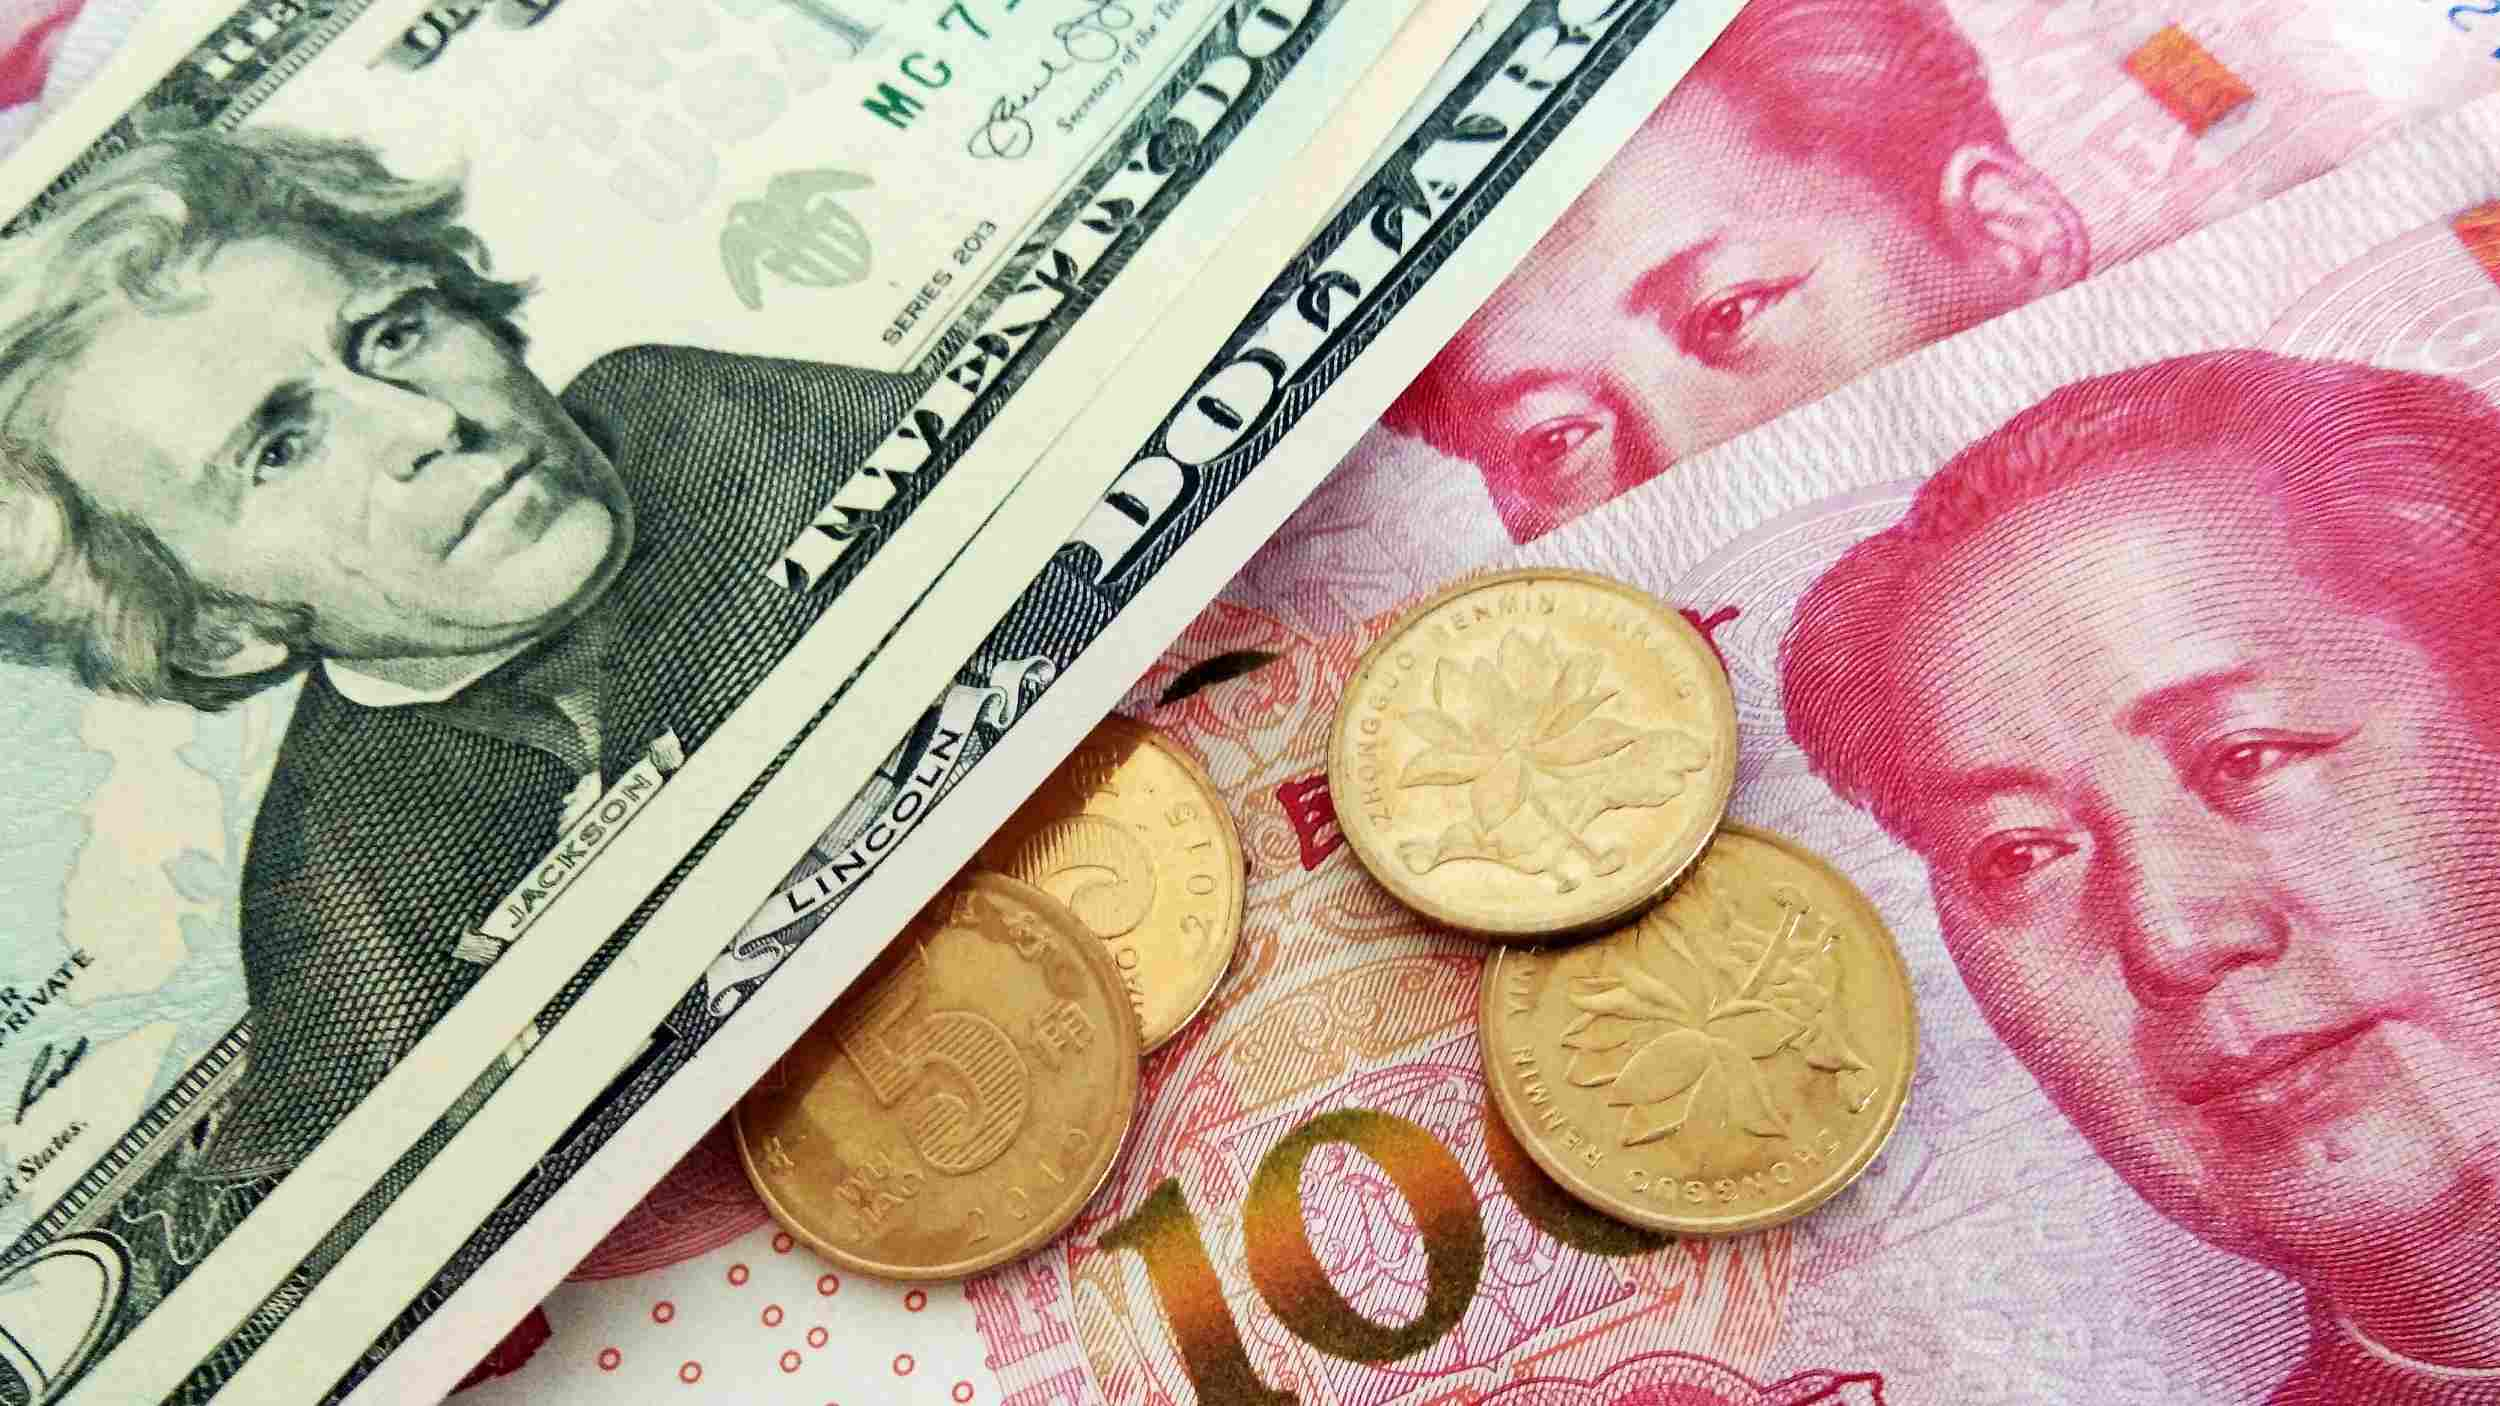 China, US markets encouraged by trade hopes